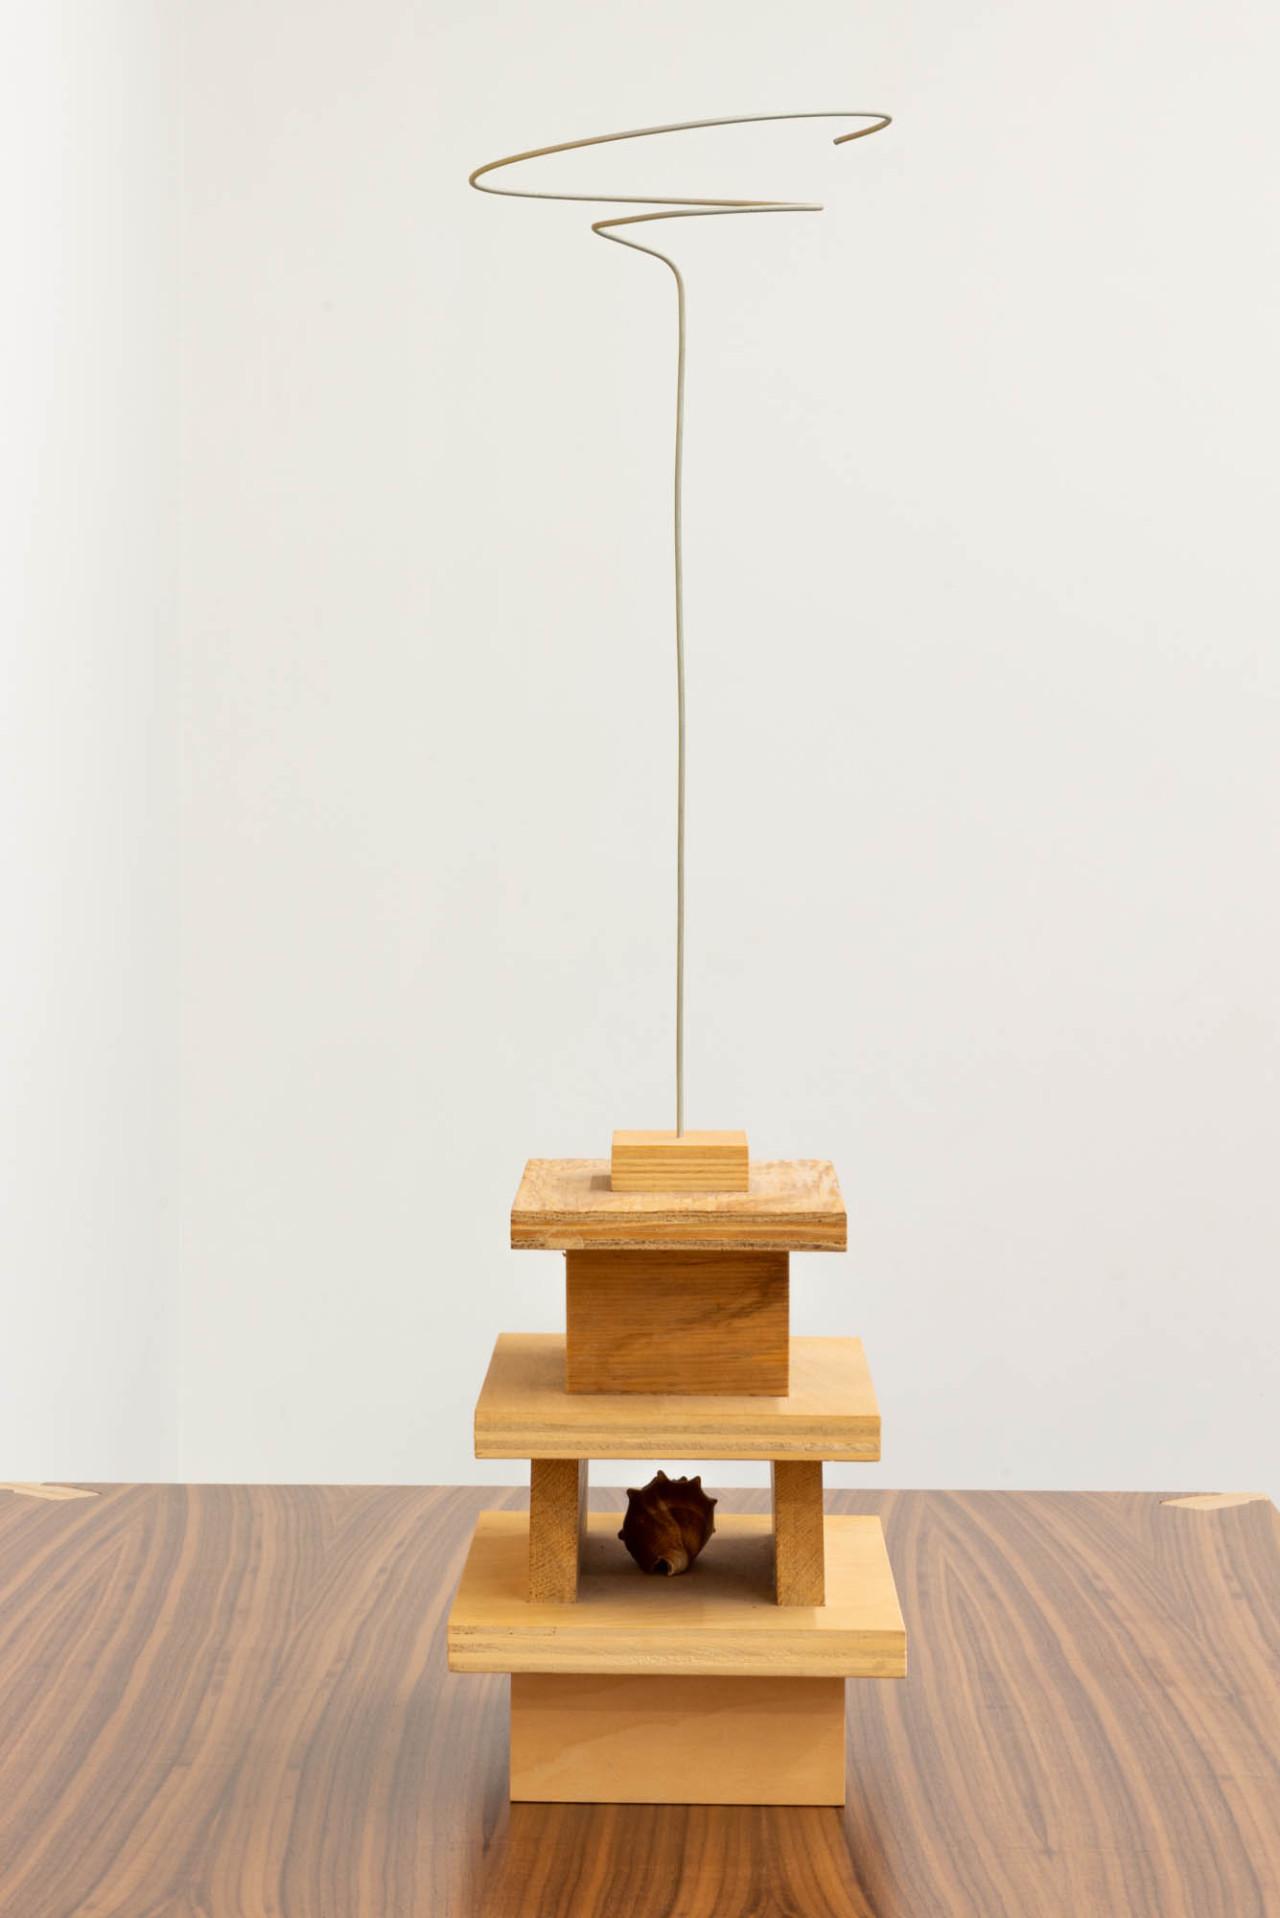 Miduny,  MiMi table , Canaletto walnut, furniture grade birch plywood and orange paint; B. Wurtz,  Untitled , wood, can, shell, wire. Photo: Yael Eban.